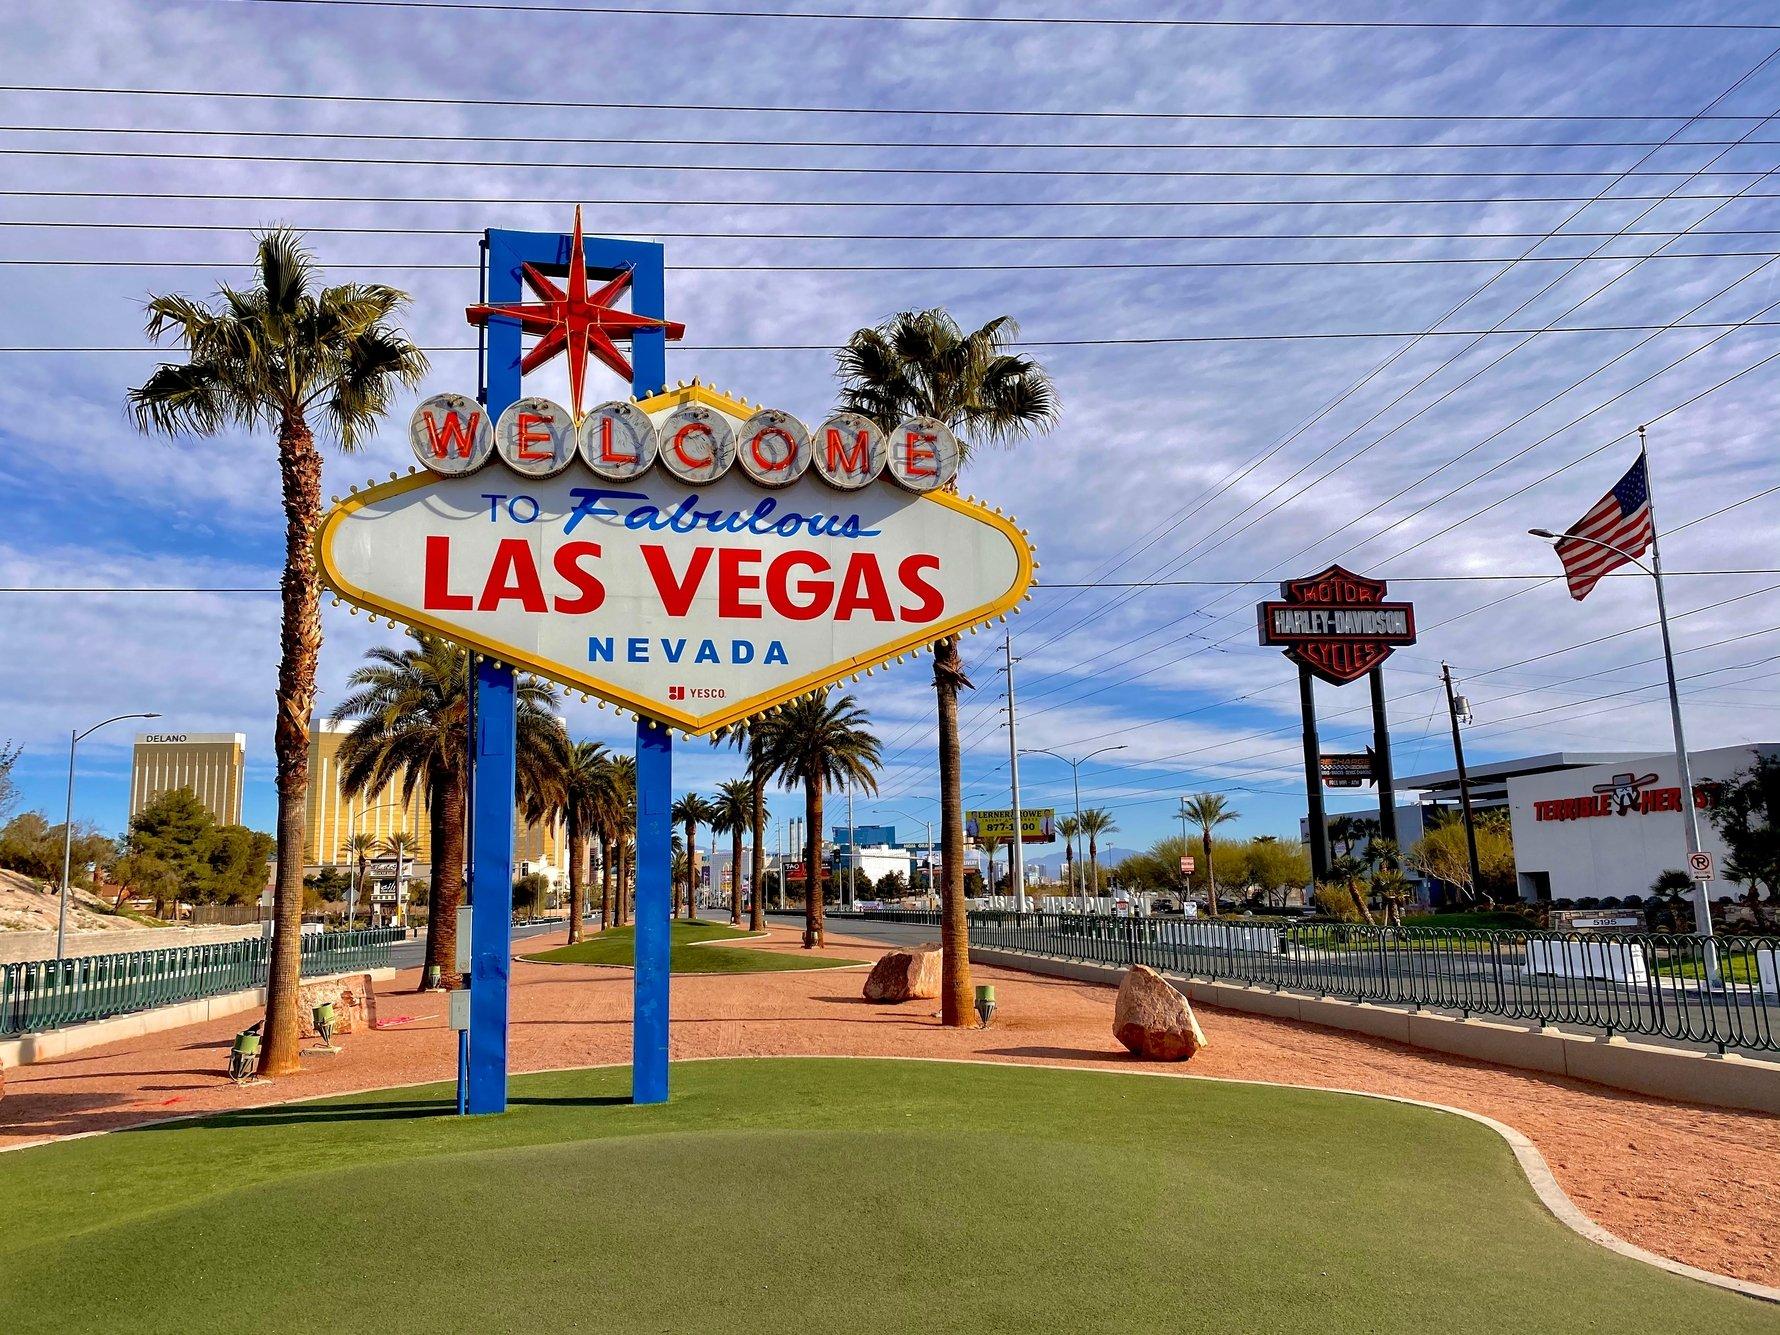 Luxurious Las Vegas and a Tale of Shimmering Casinos © David Lusvardi / Unsplash